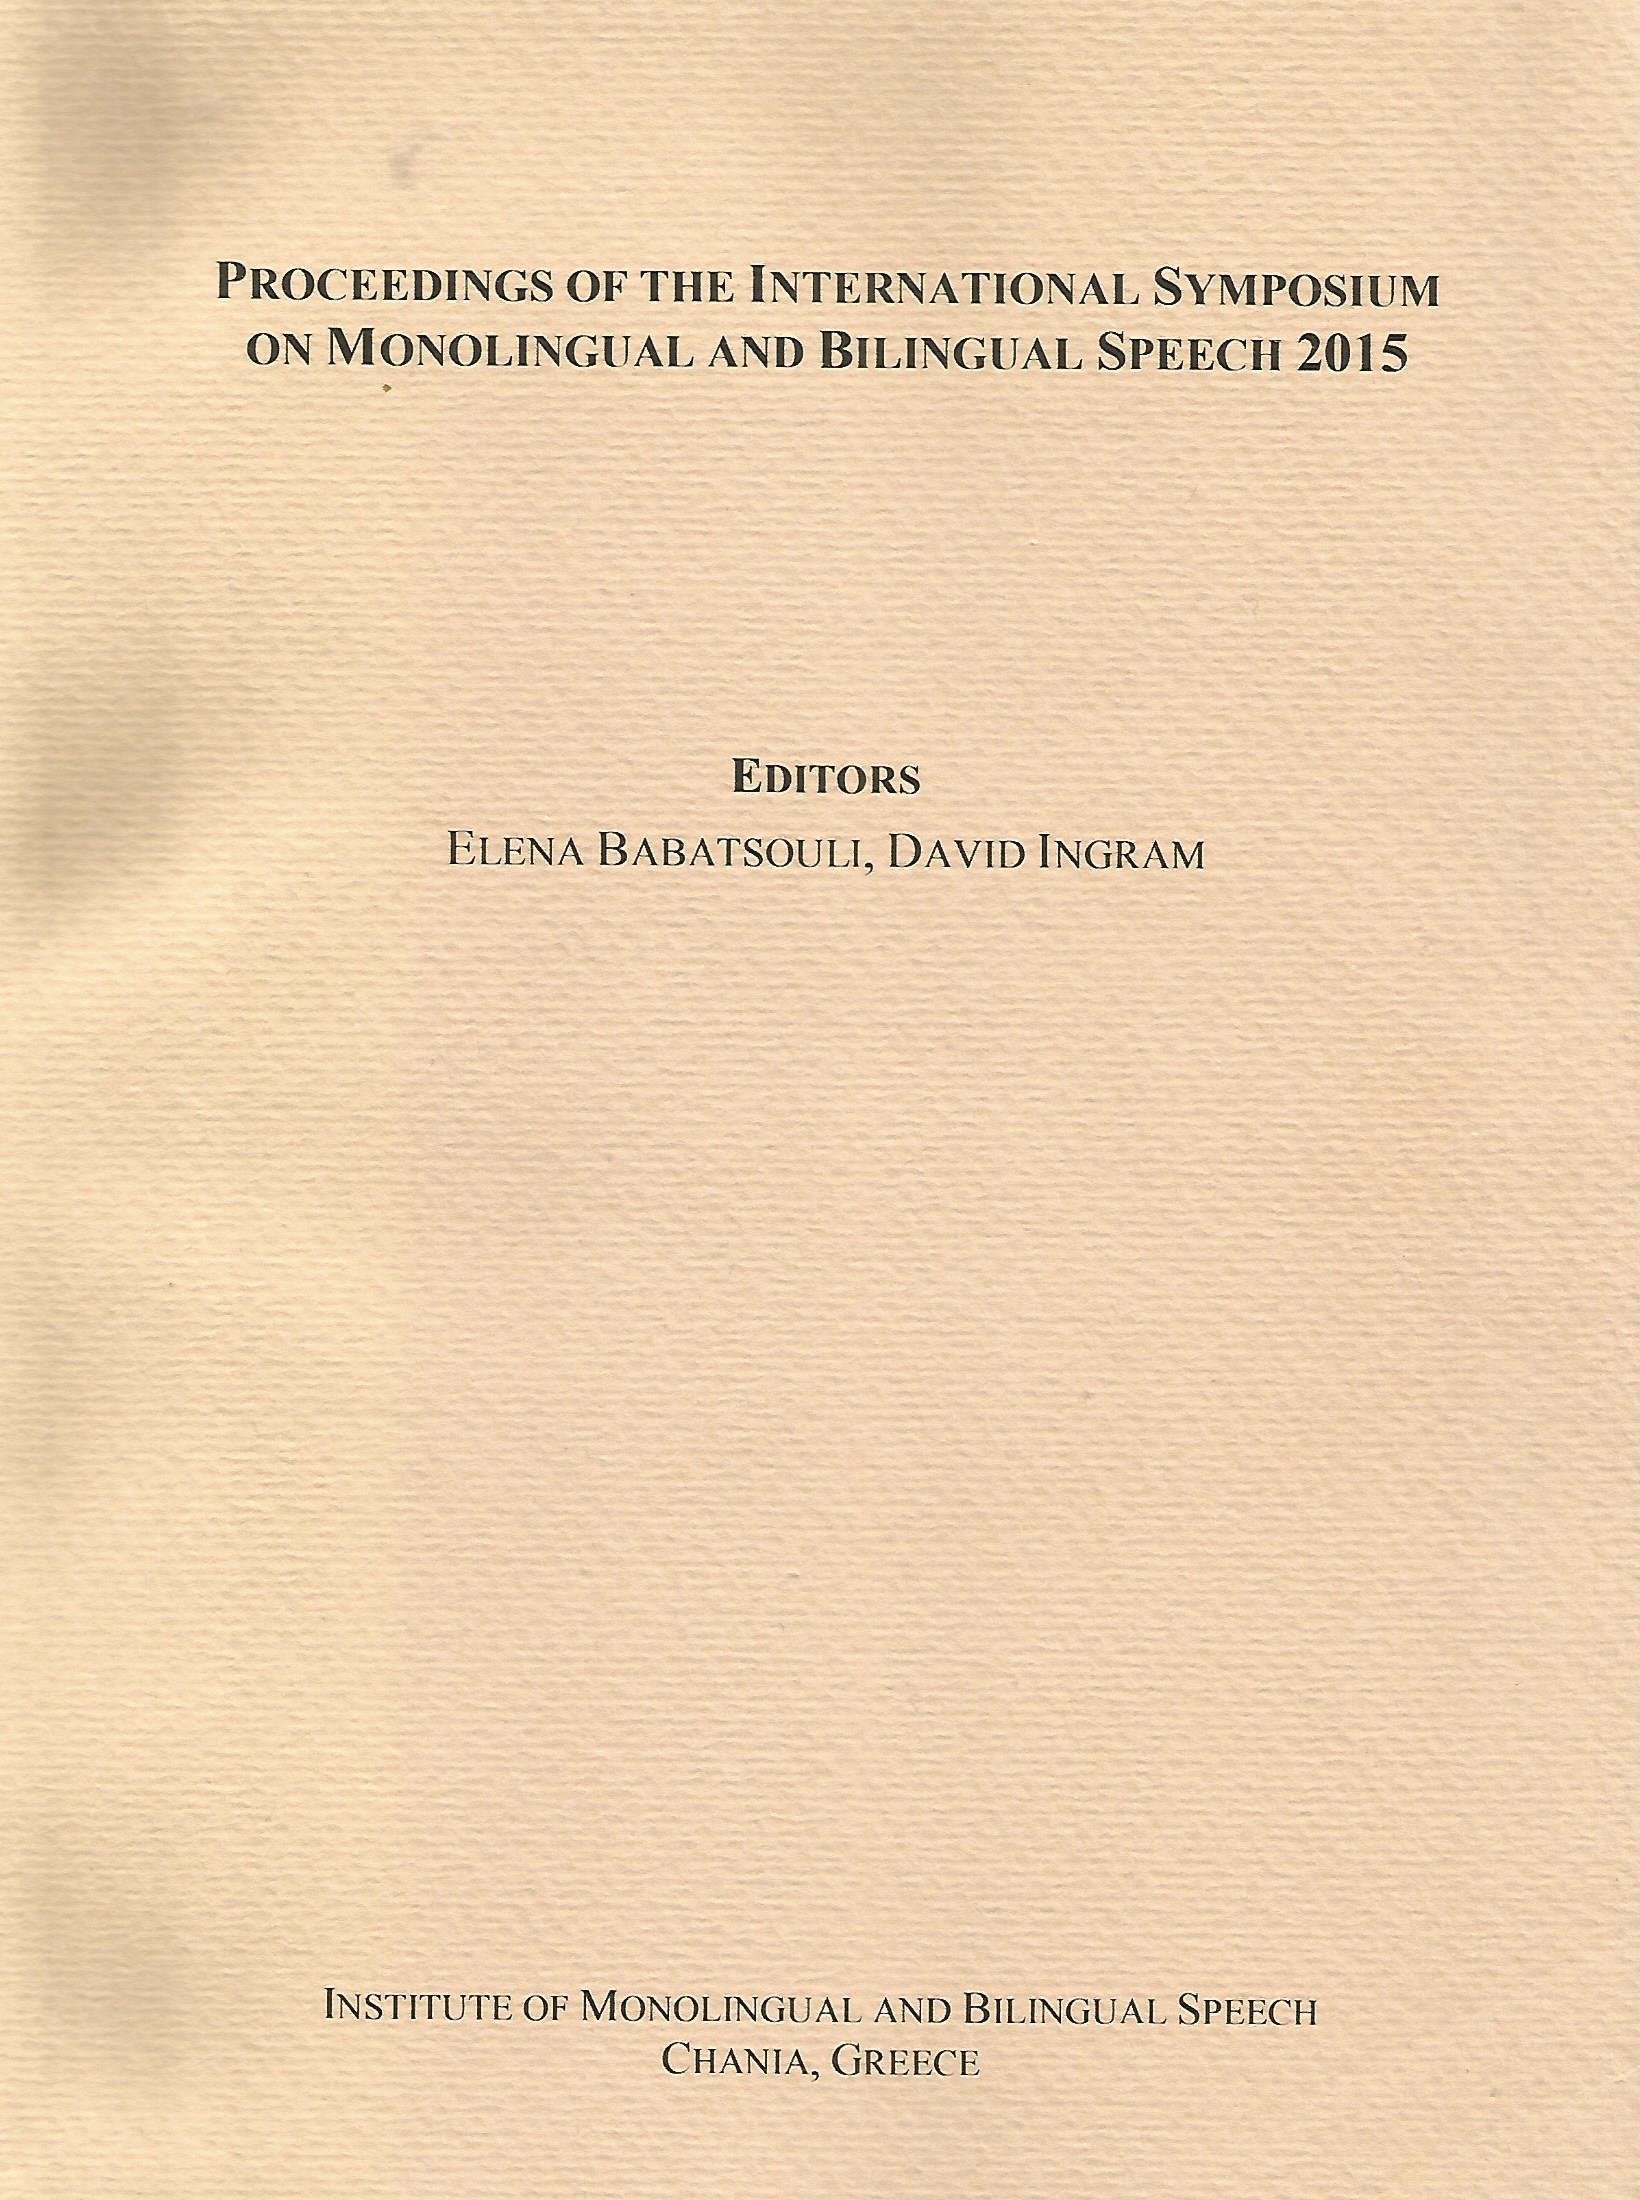 ISMBS 2015 Proceedings